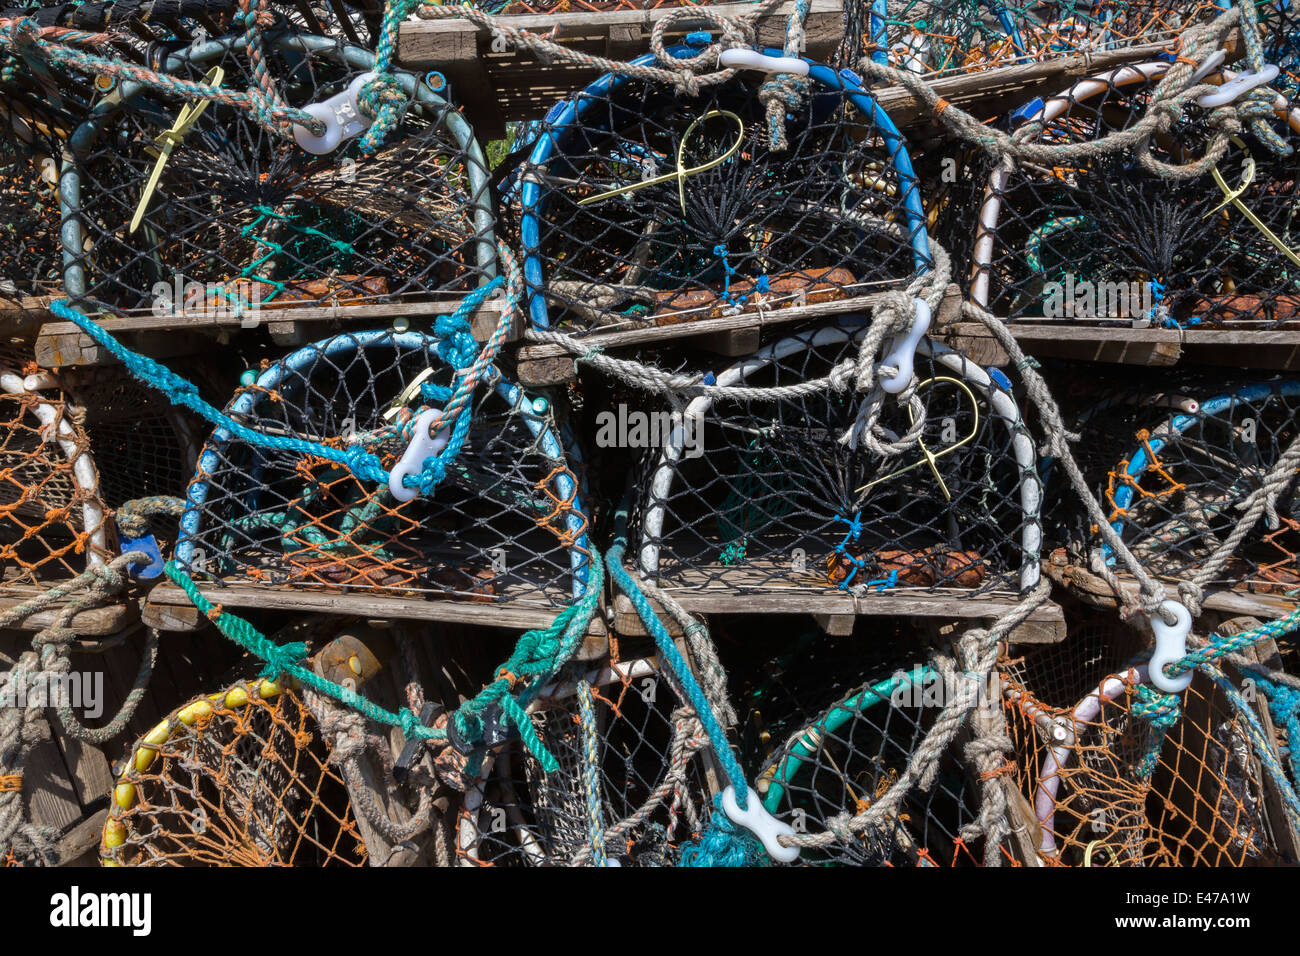 Lobster pots at Seahouses, Northumberland, May 2014 - Stock Image